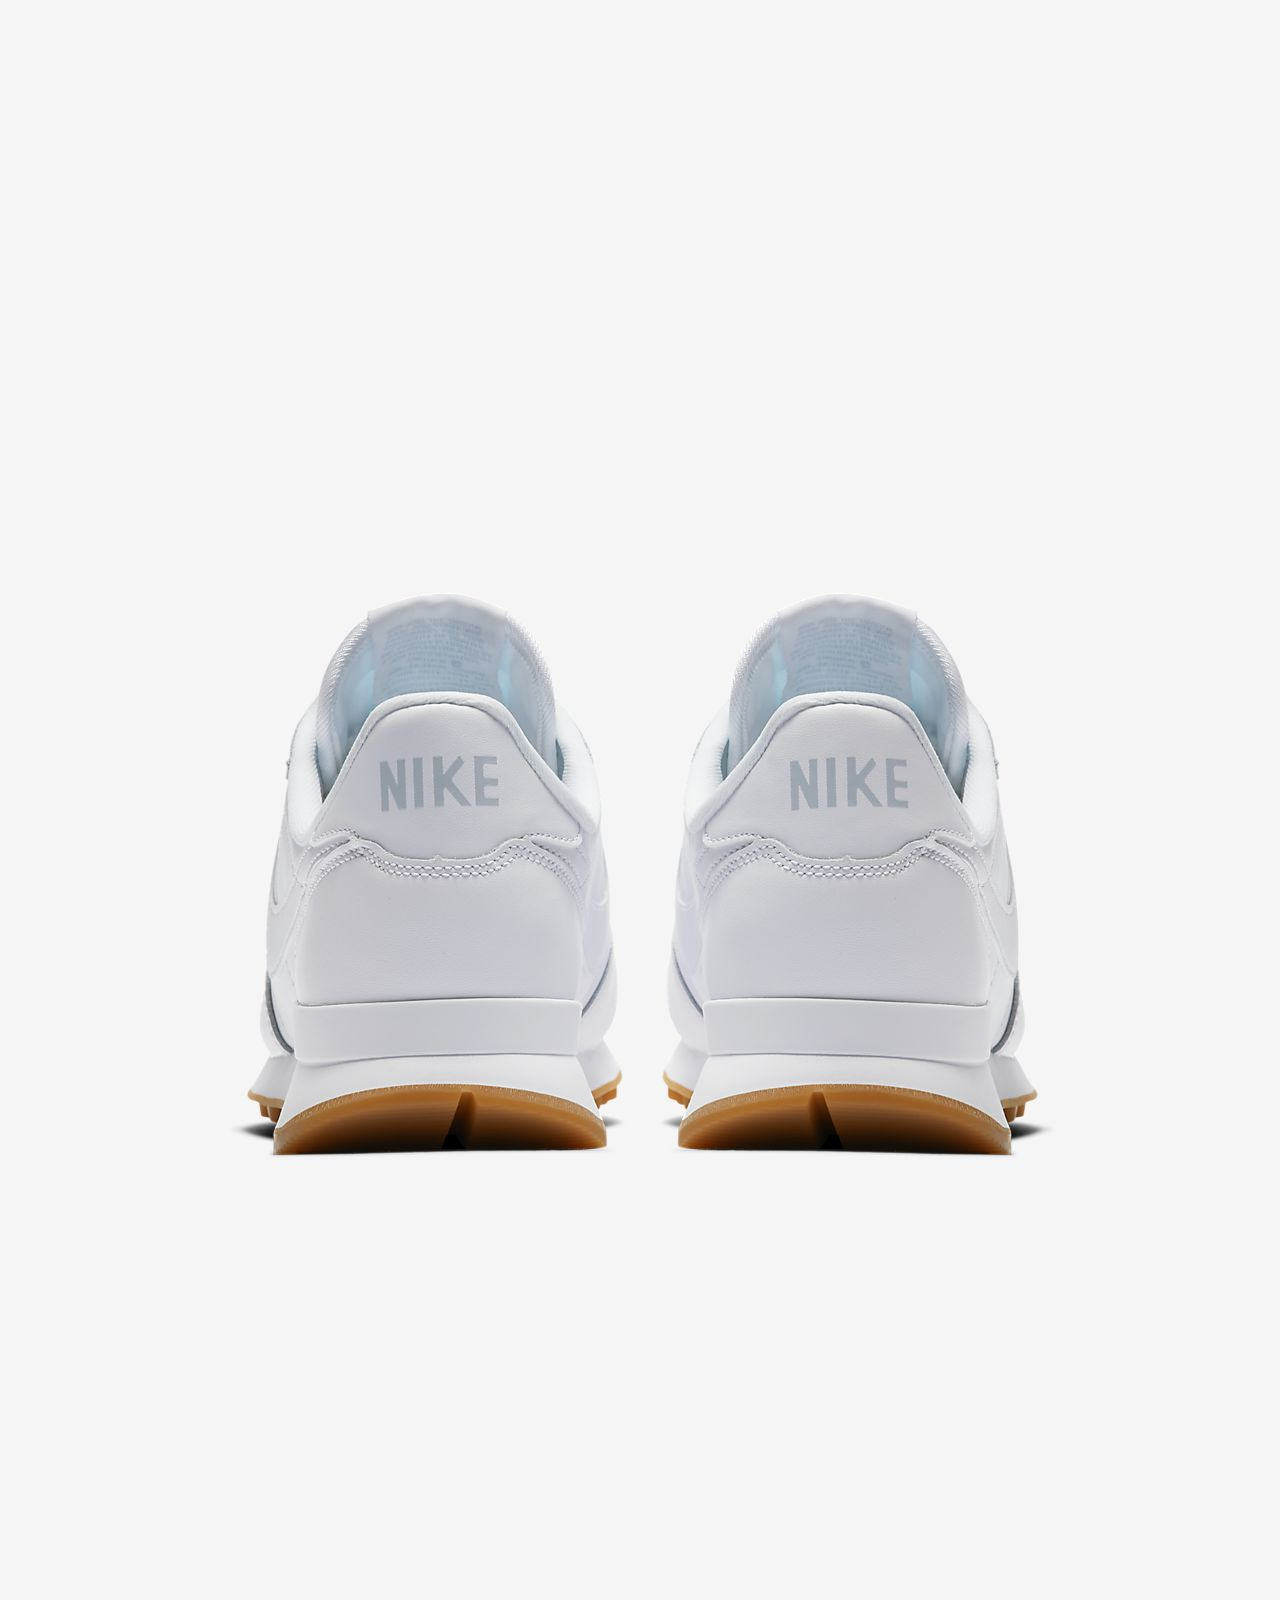 Nike Internationalist Women blackthunder greyhalf blue